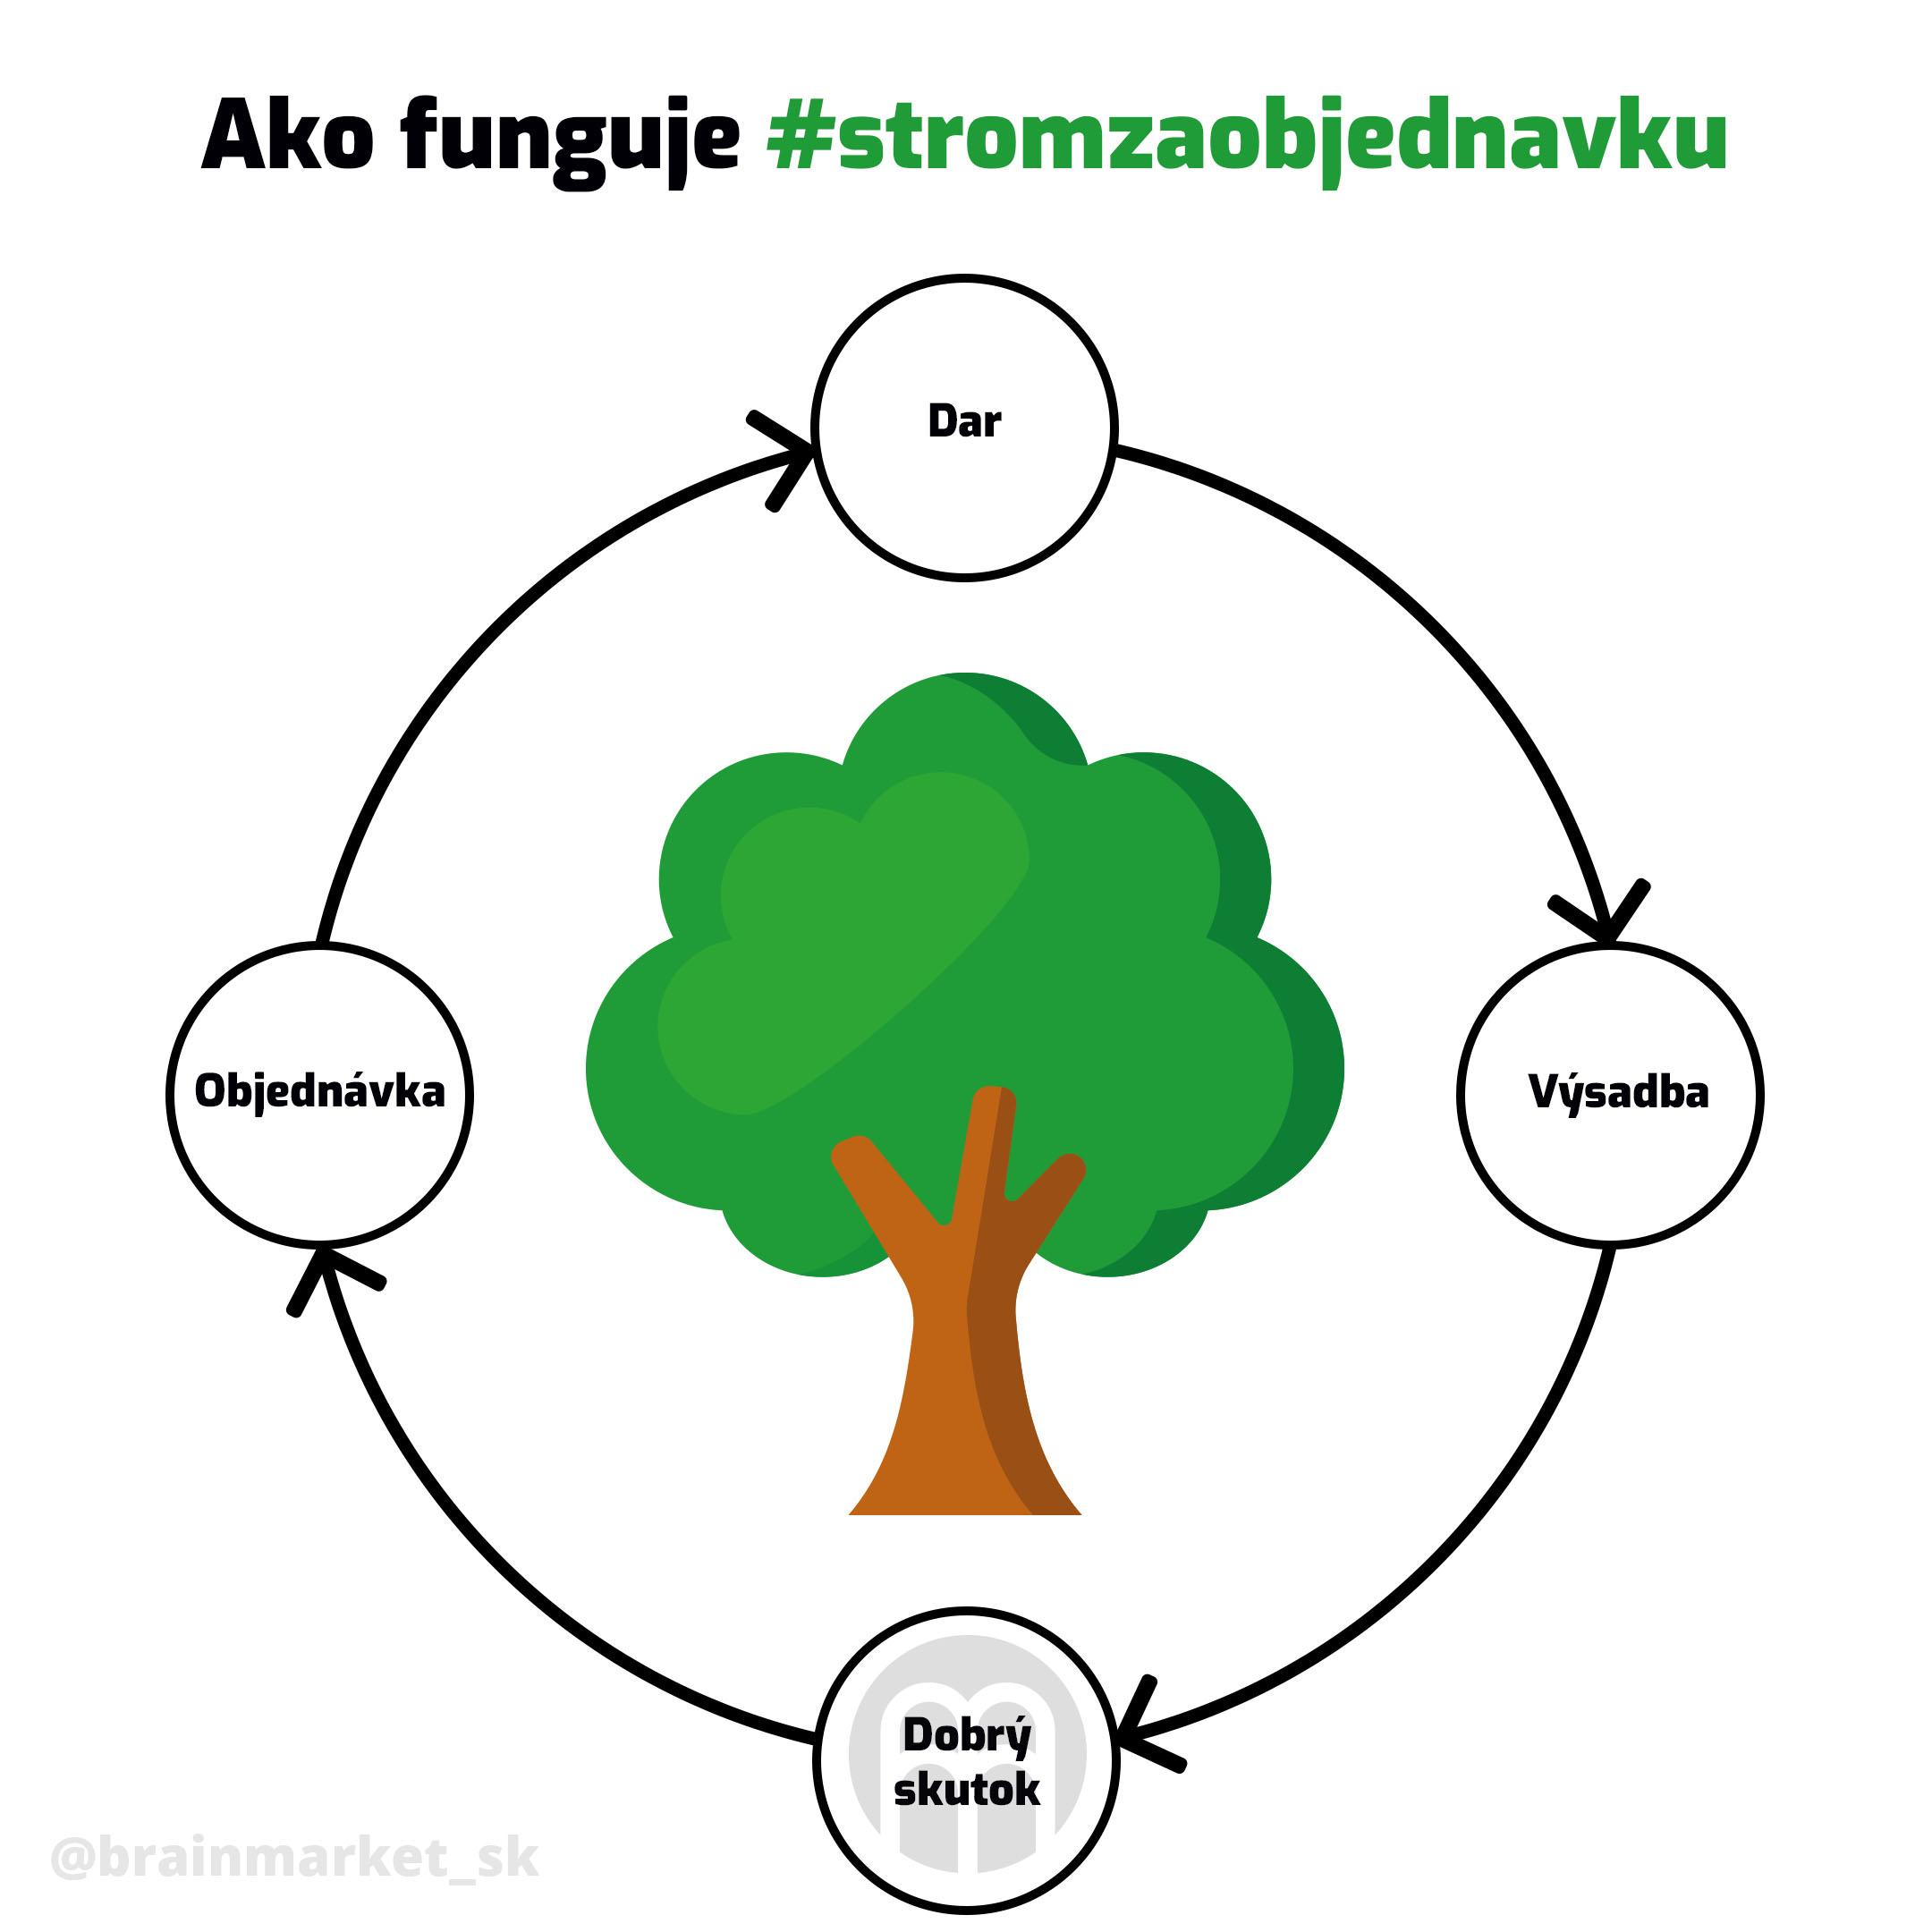 ako_funguje_strom_za_objednavku_sk_Infografika_Instagram_BrainMarket